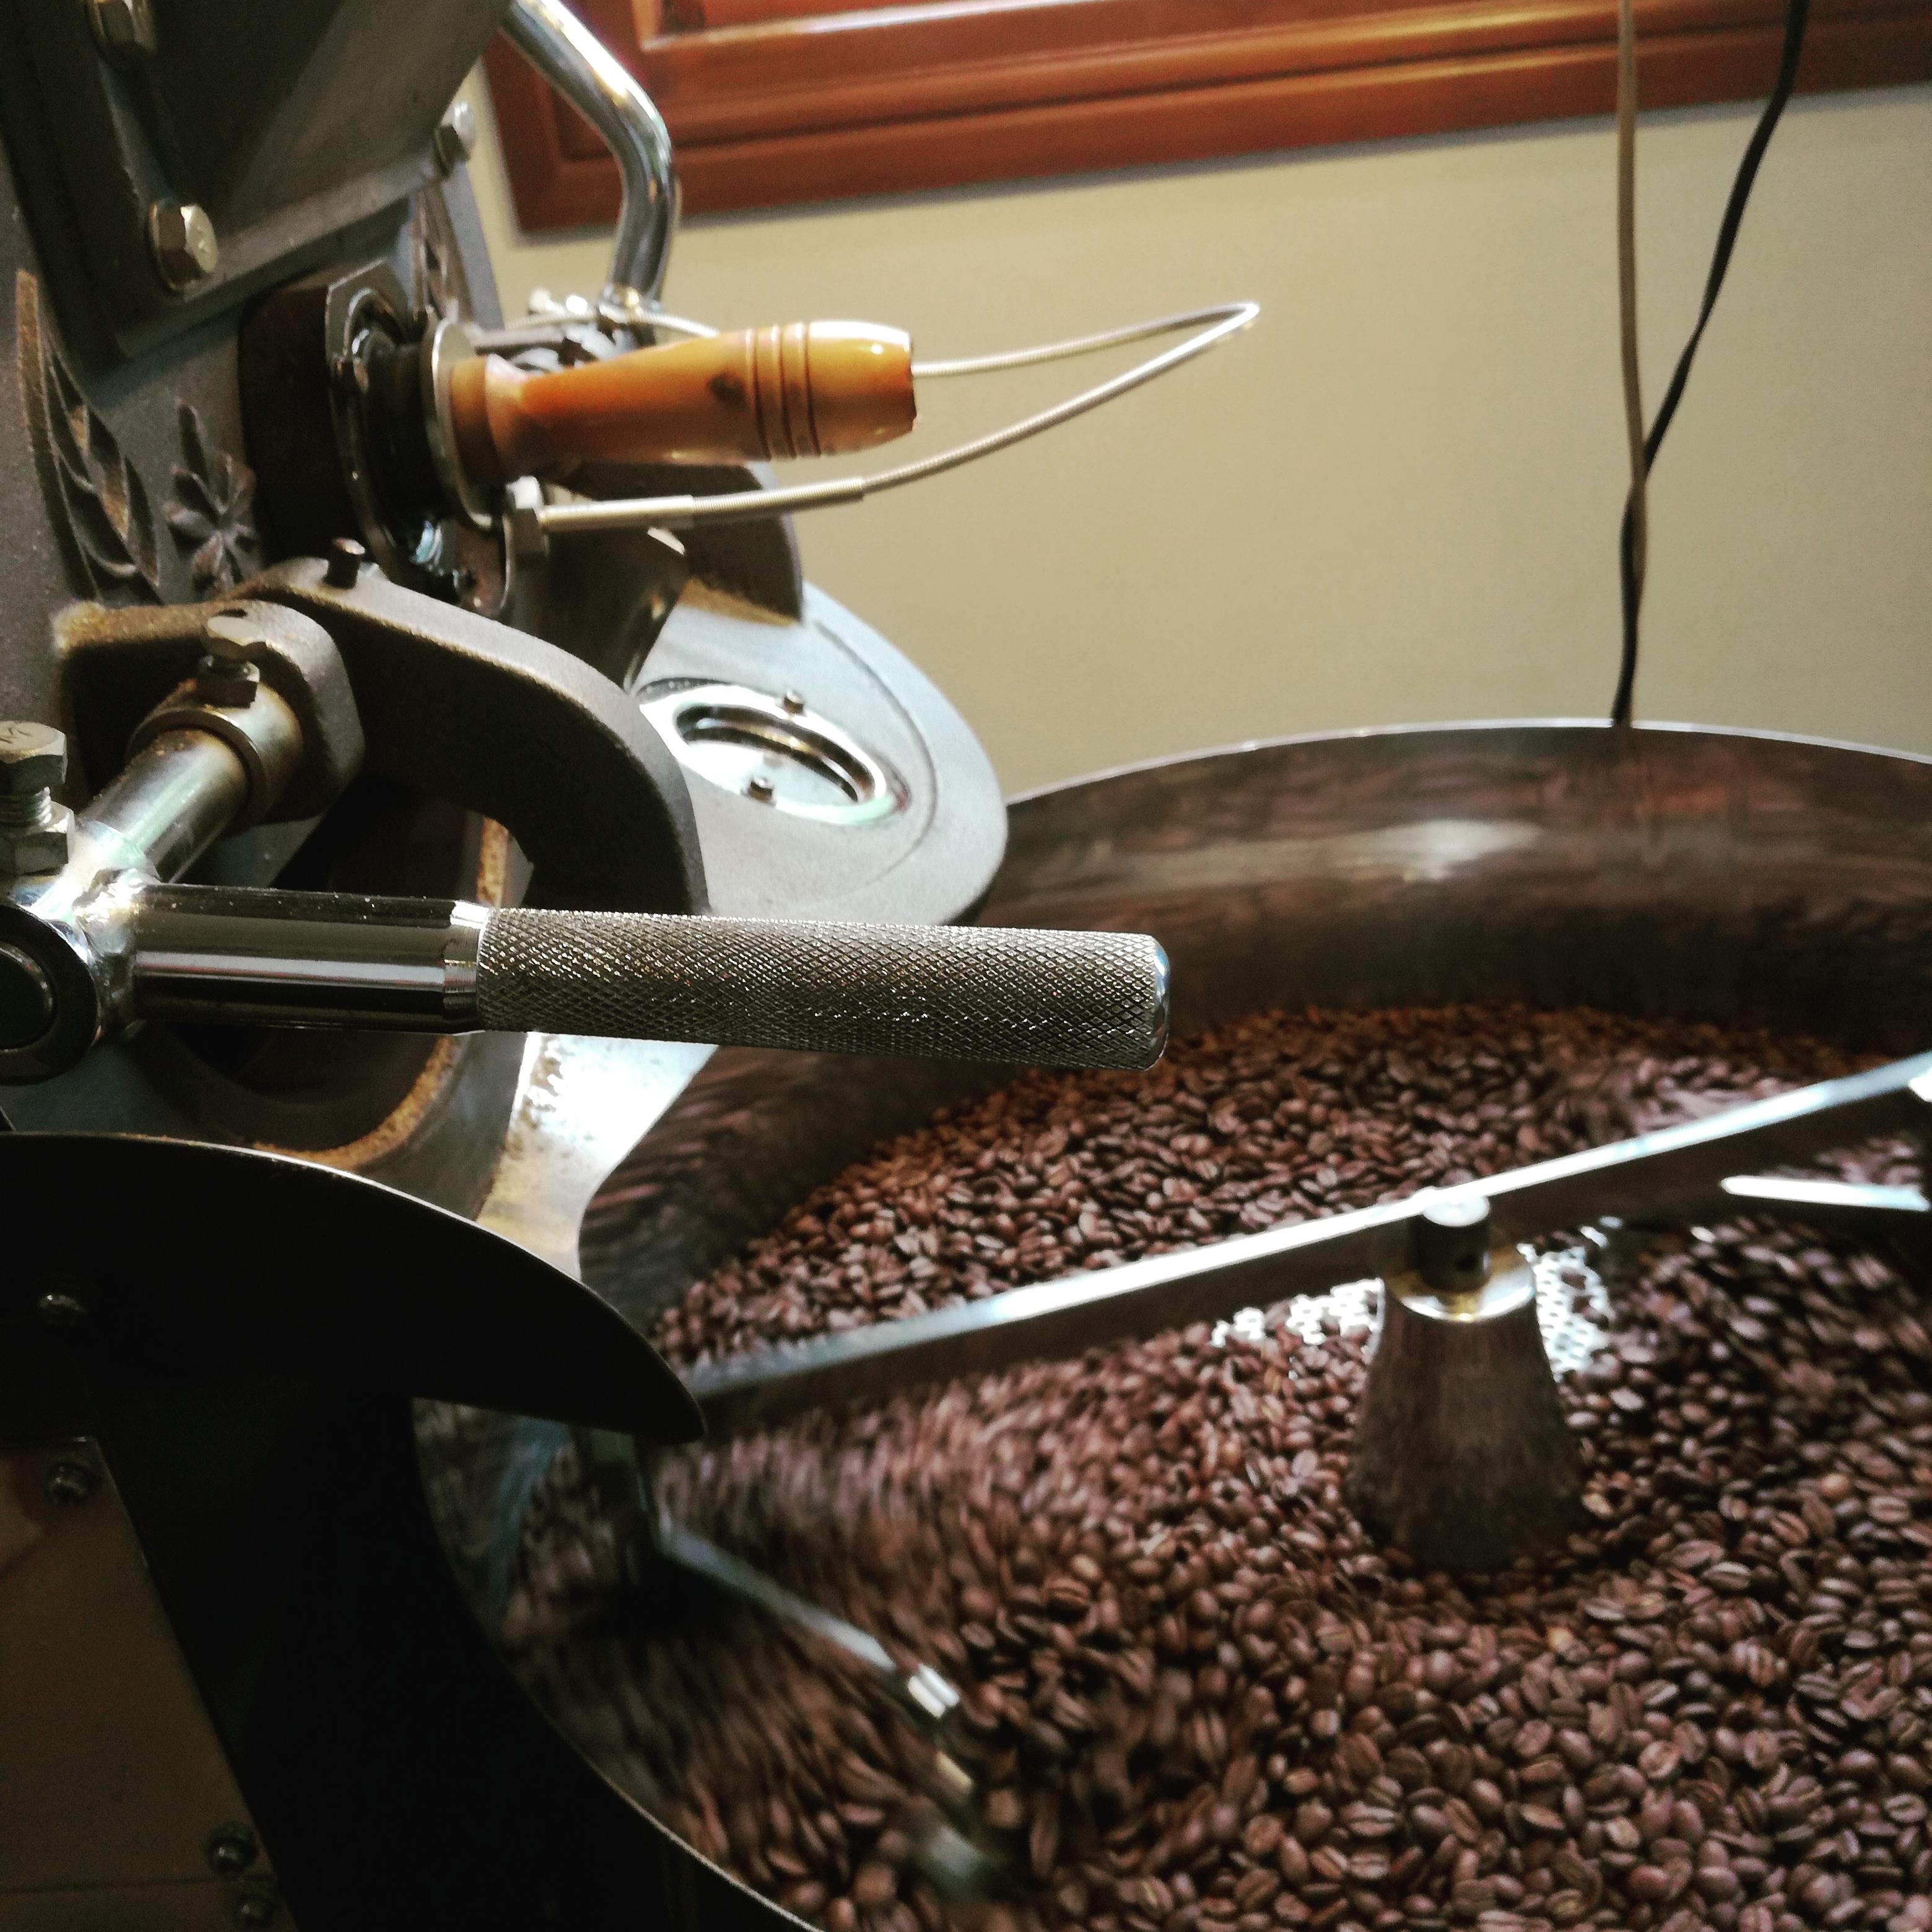 CAFFE BERNINI(自家焙煎珈琲屋カフェベルニーニ)